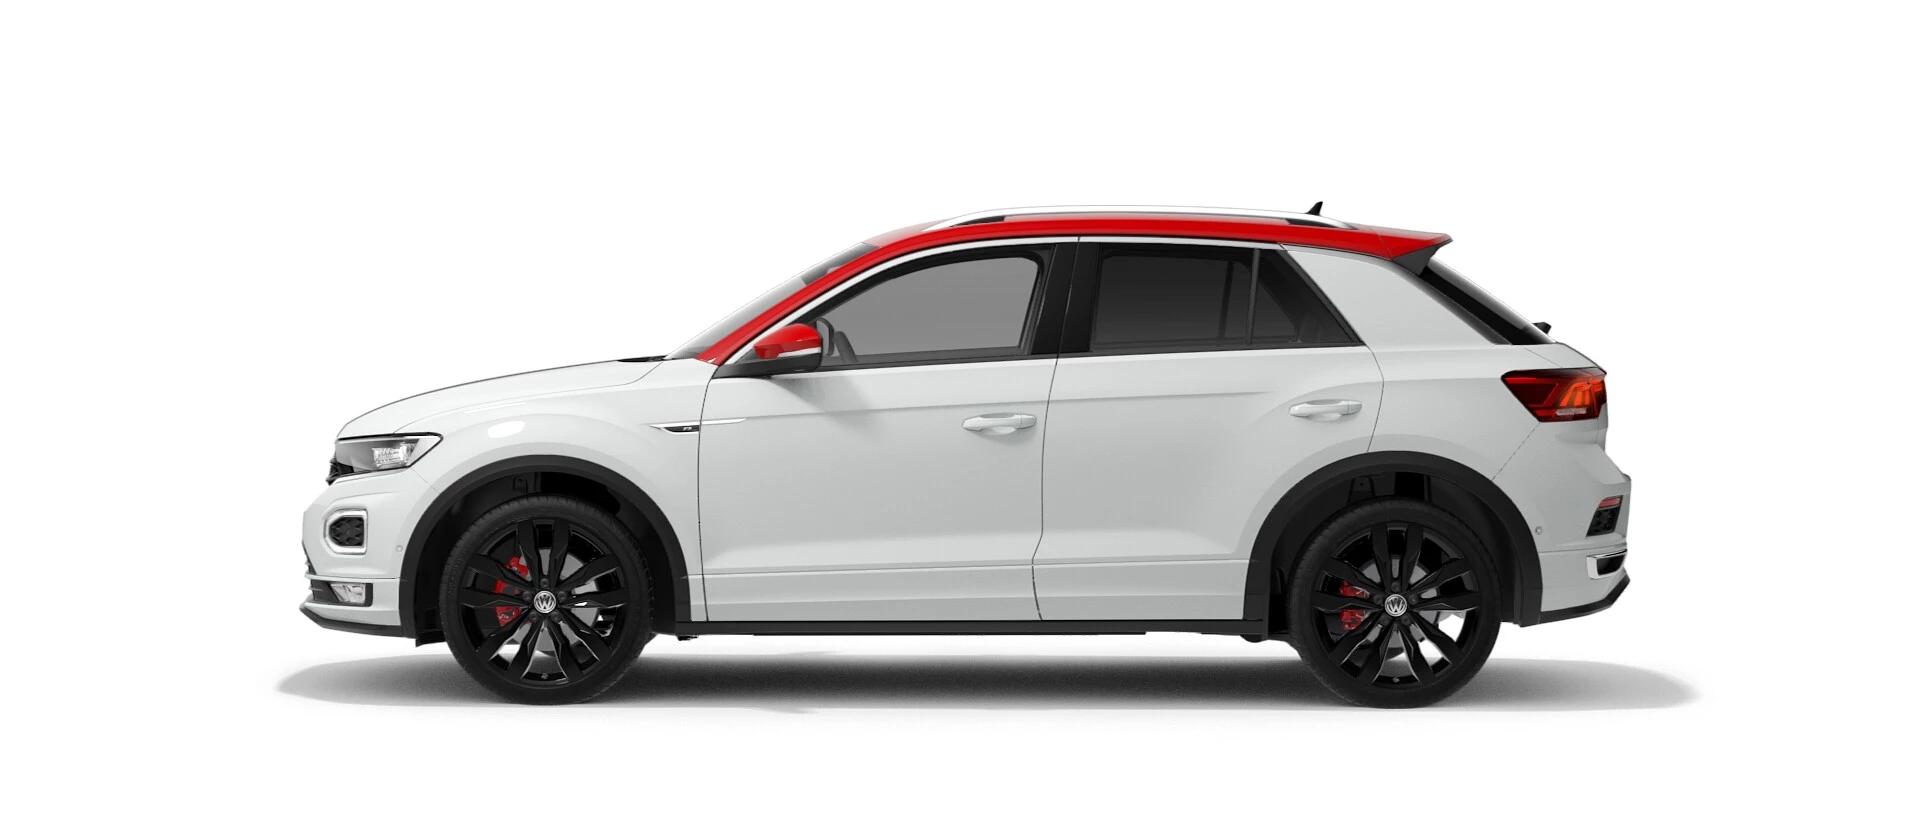 2020 Volkswagen T-Roc T-Roc X Wagon